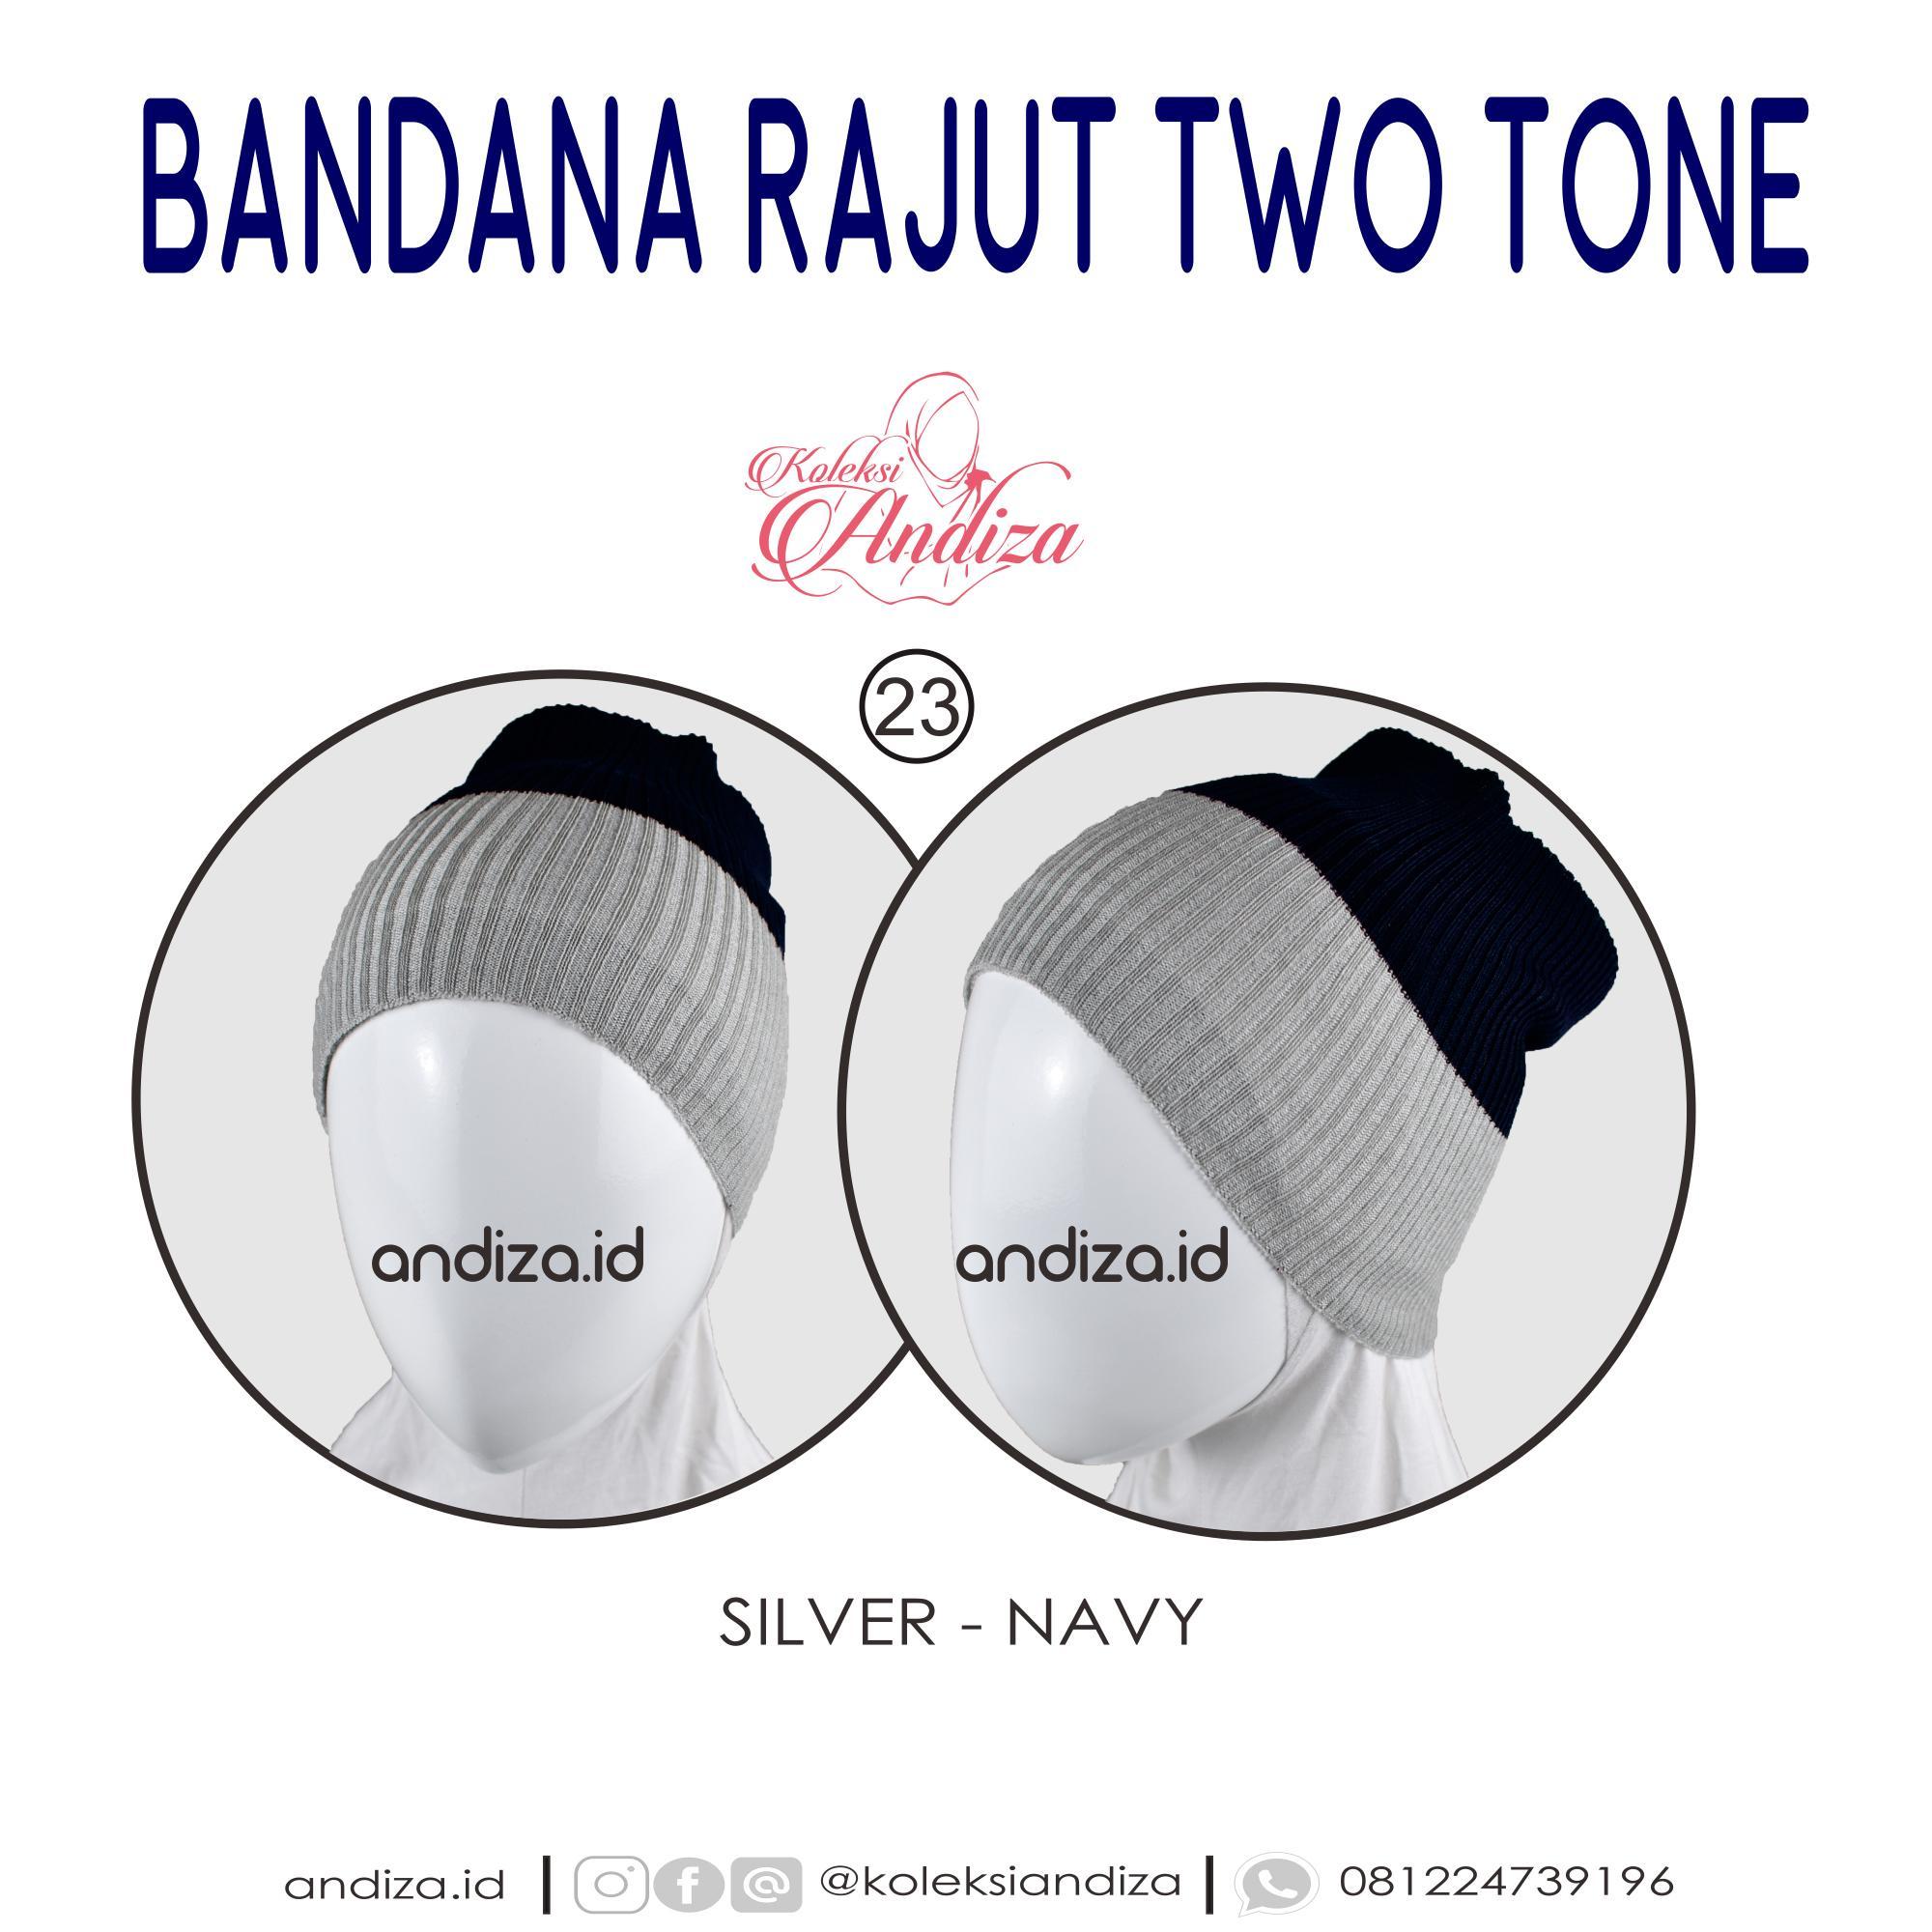 Buy Sell Cheapest Labelledesign Bandana Rajut Best Quality Product Two Tone Kerut Andiza Satu Ciput Isi 2 Dua Warna Lebih Hemat